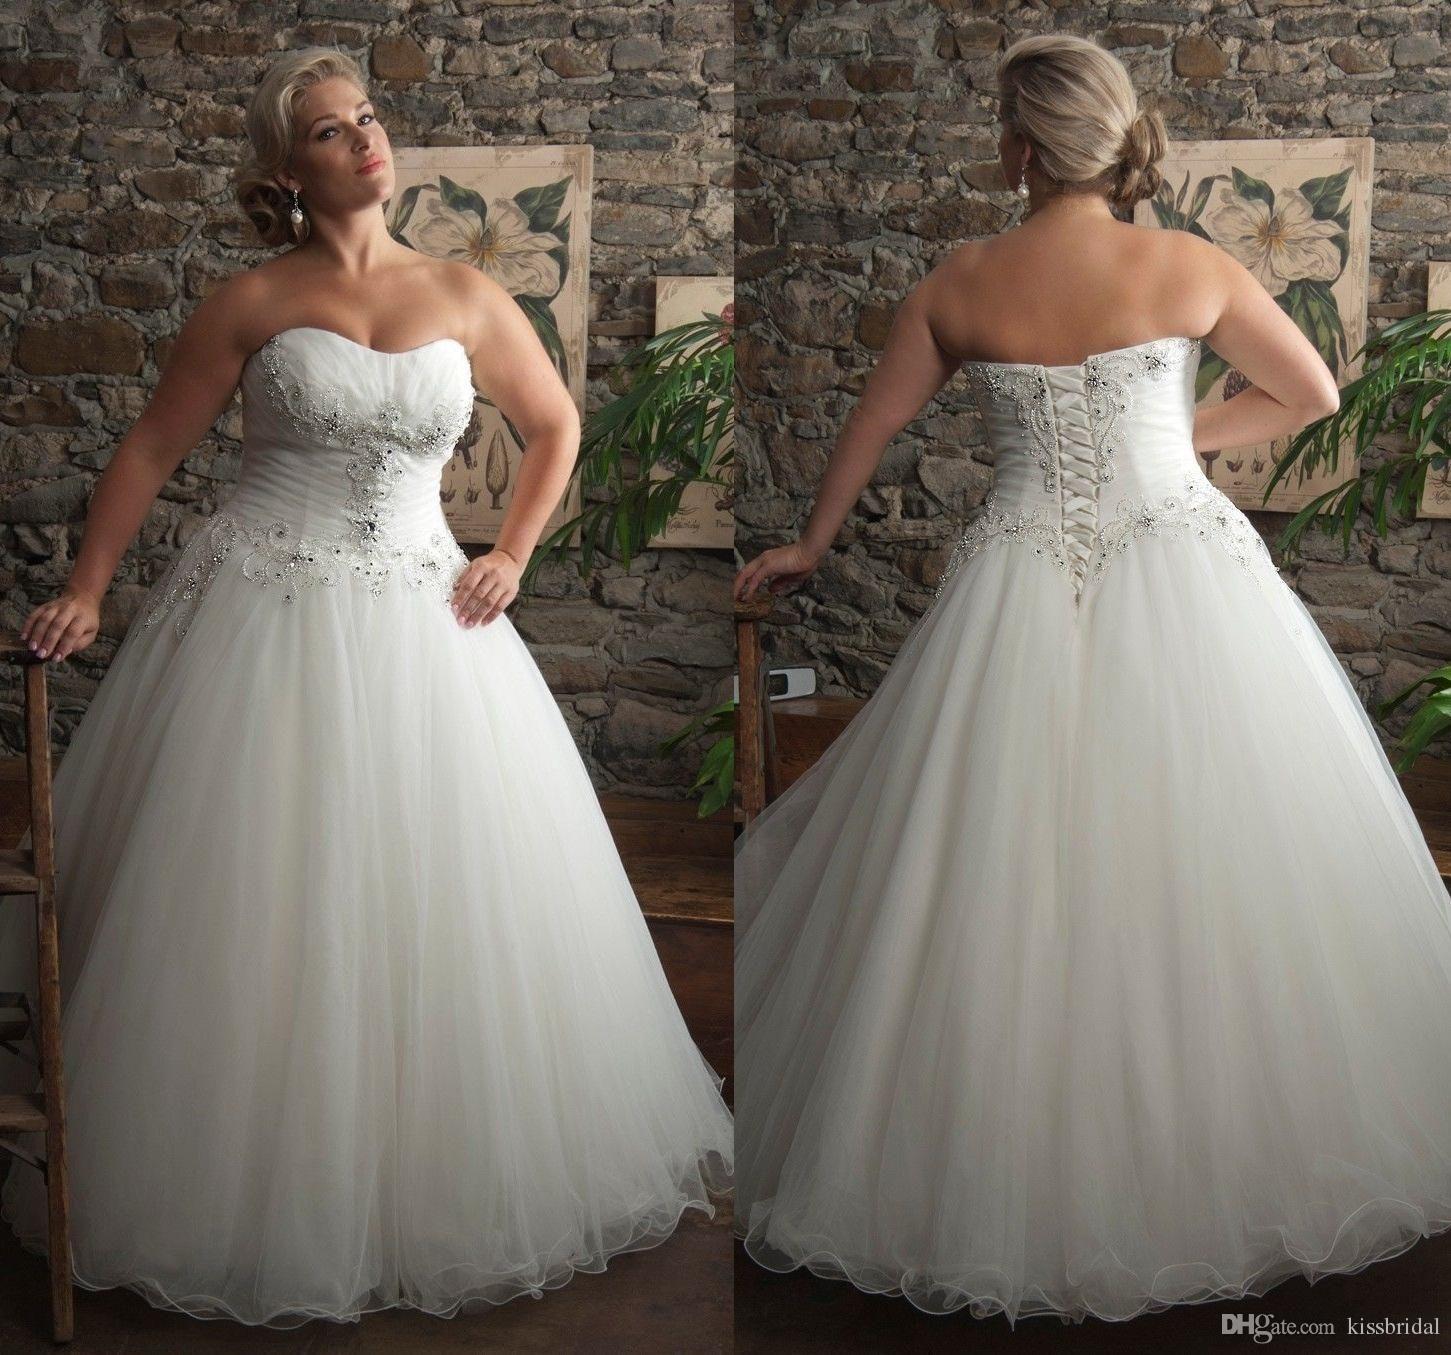 2015 Kissbridal Plus Size Wedding Dress Under 100 Off The Shoulder Pleated White S Plus Size Wedding Gowns Wedding Dresses Plus Size Wedding Dresses Strapless